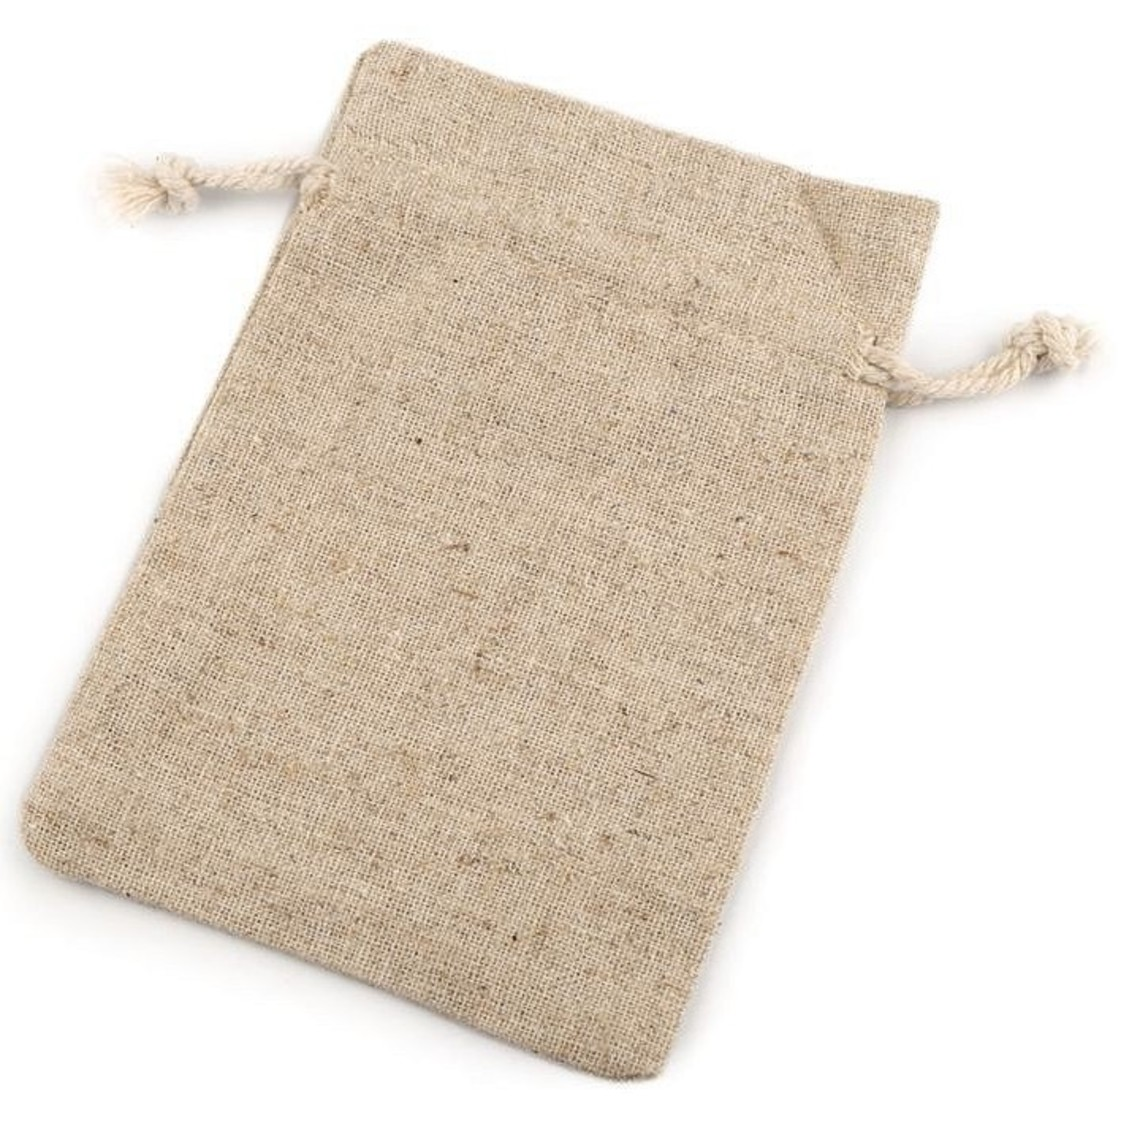 Linnen taske 10 x 14 cm